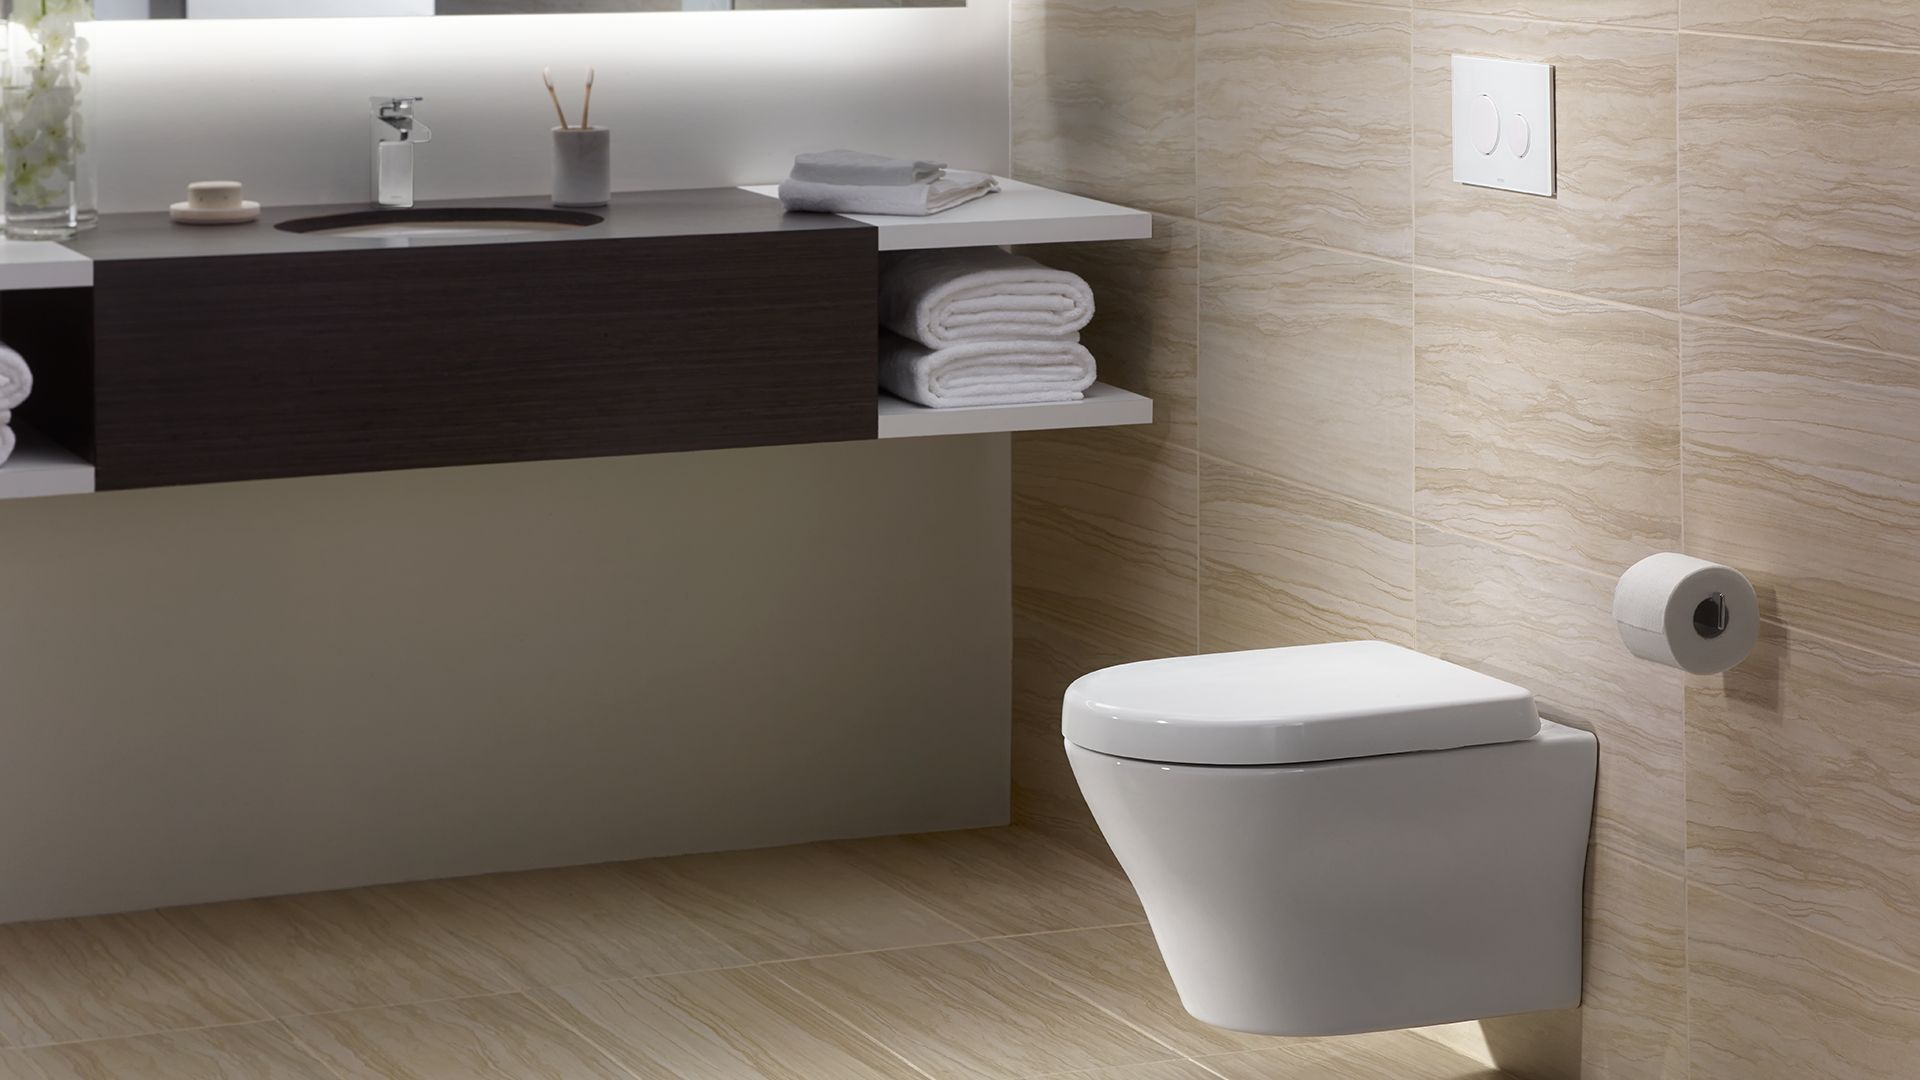 MH® Wall-Hung Dual-Flush Toilet 1.28 GPF & 0.9 GPF D-Shaped Bowl ...